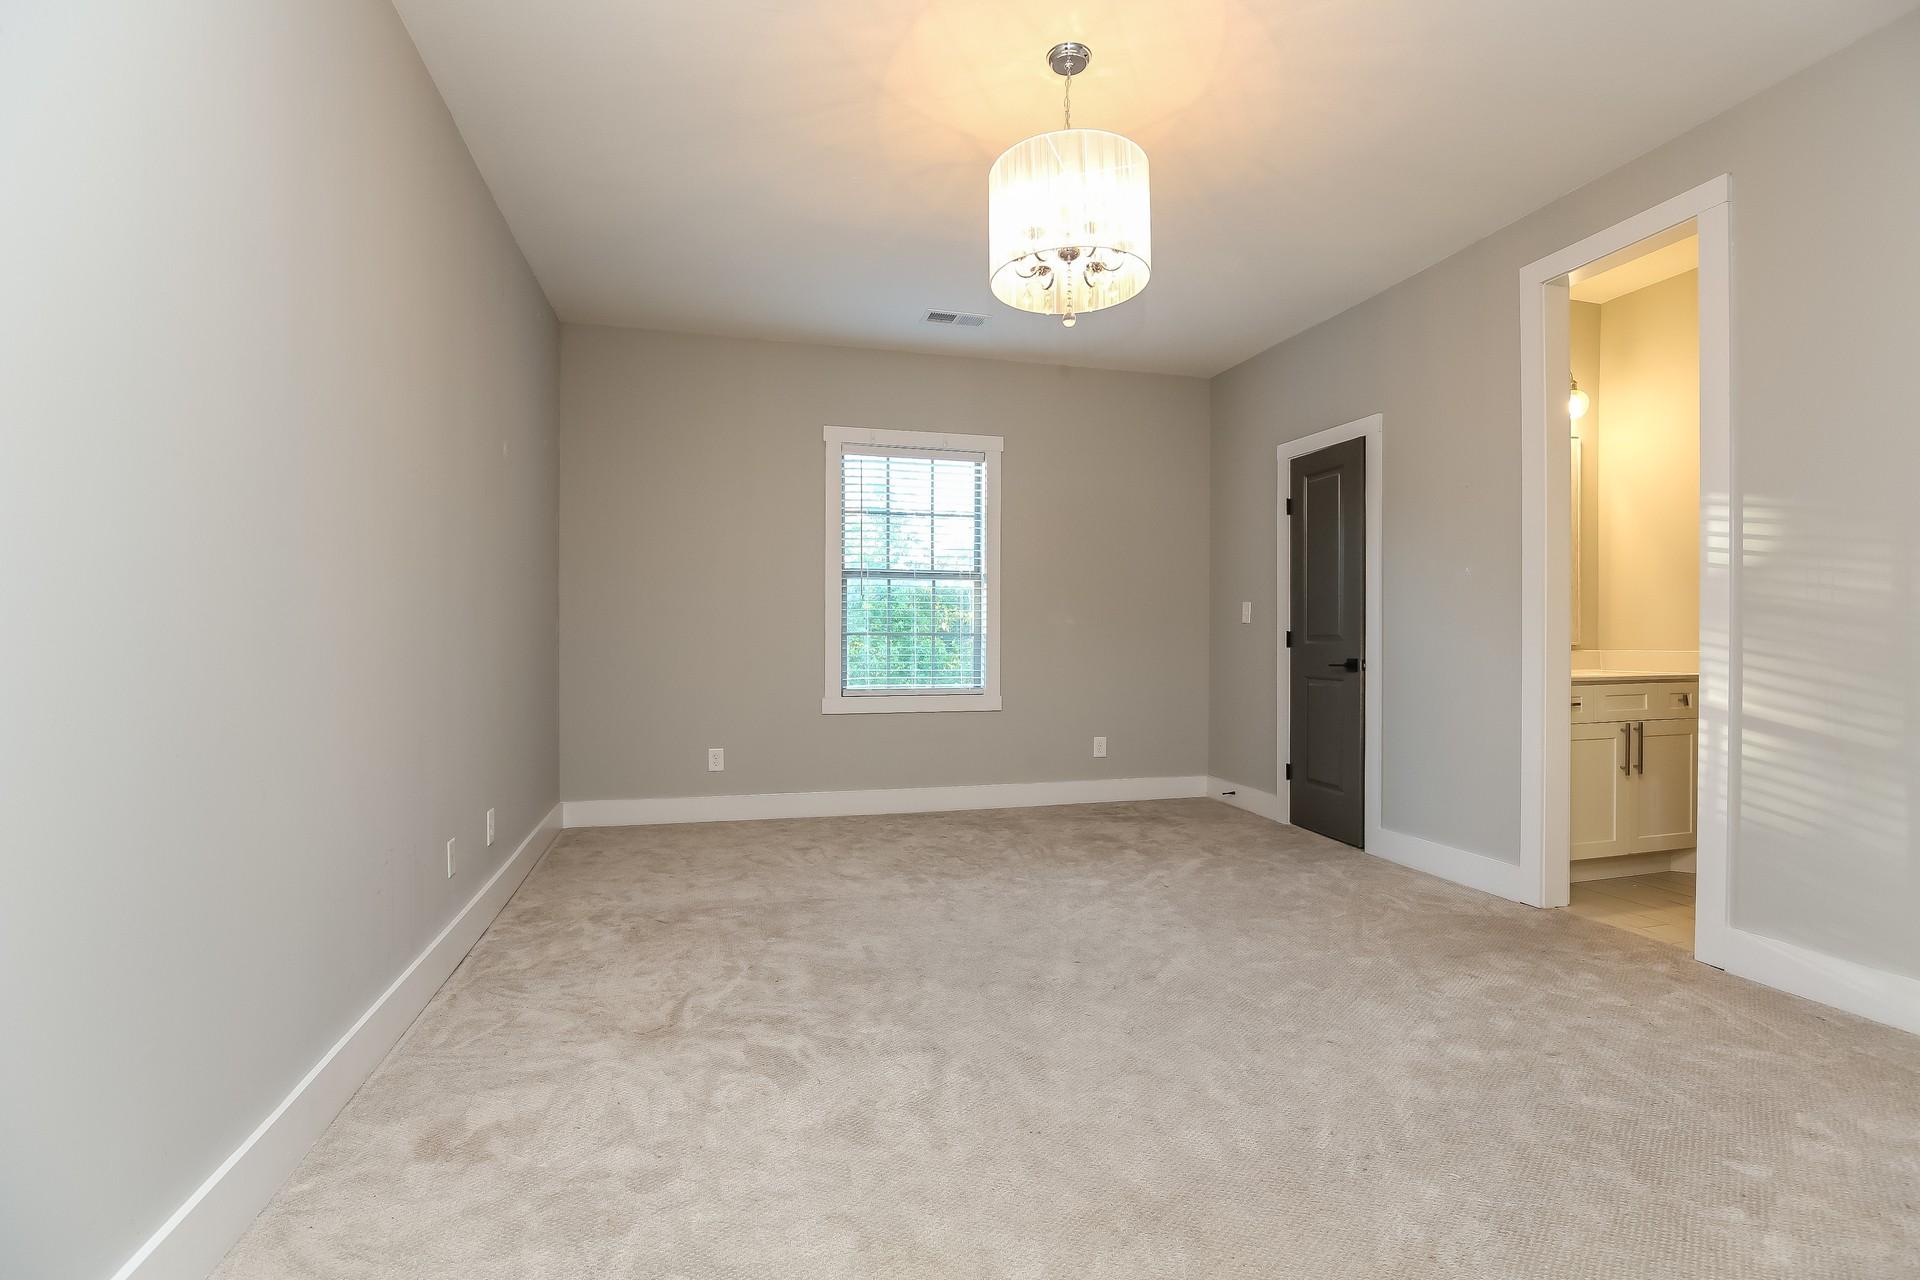 259 Harrowgate Dr Property Photo 19